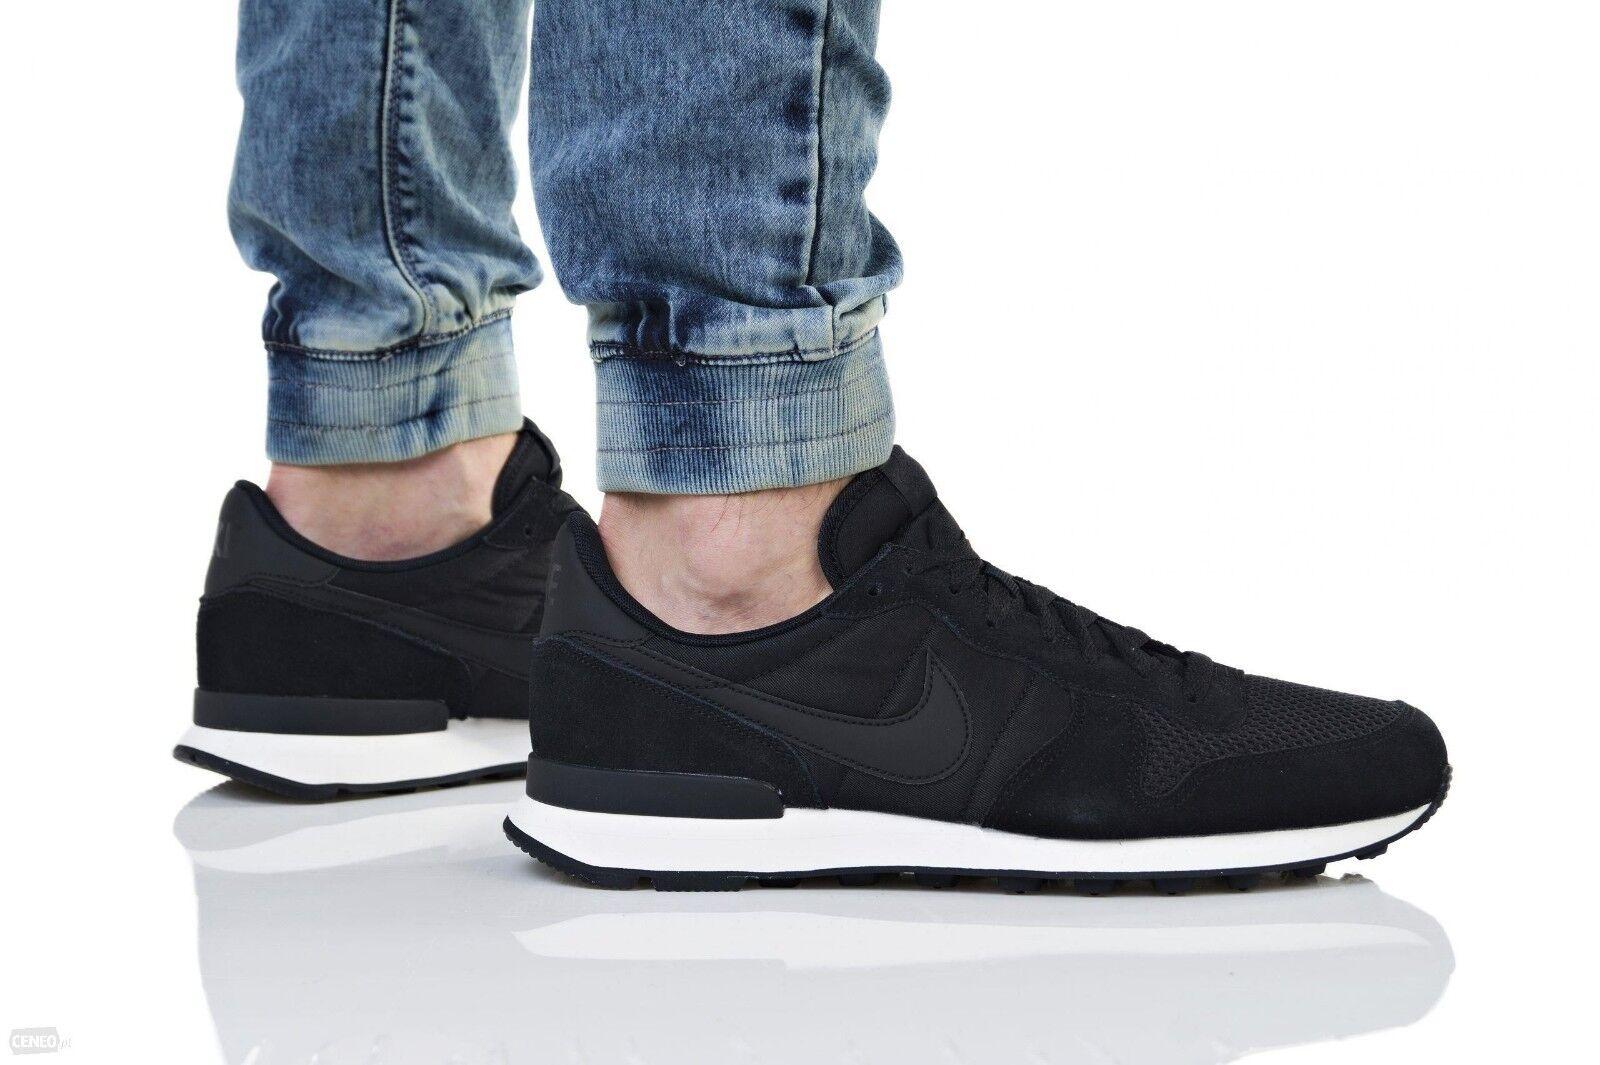 Nike Internationalist SE Black Size 11.5. AJ2024-002. presto air max